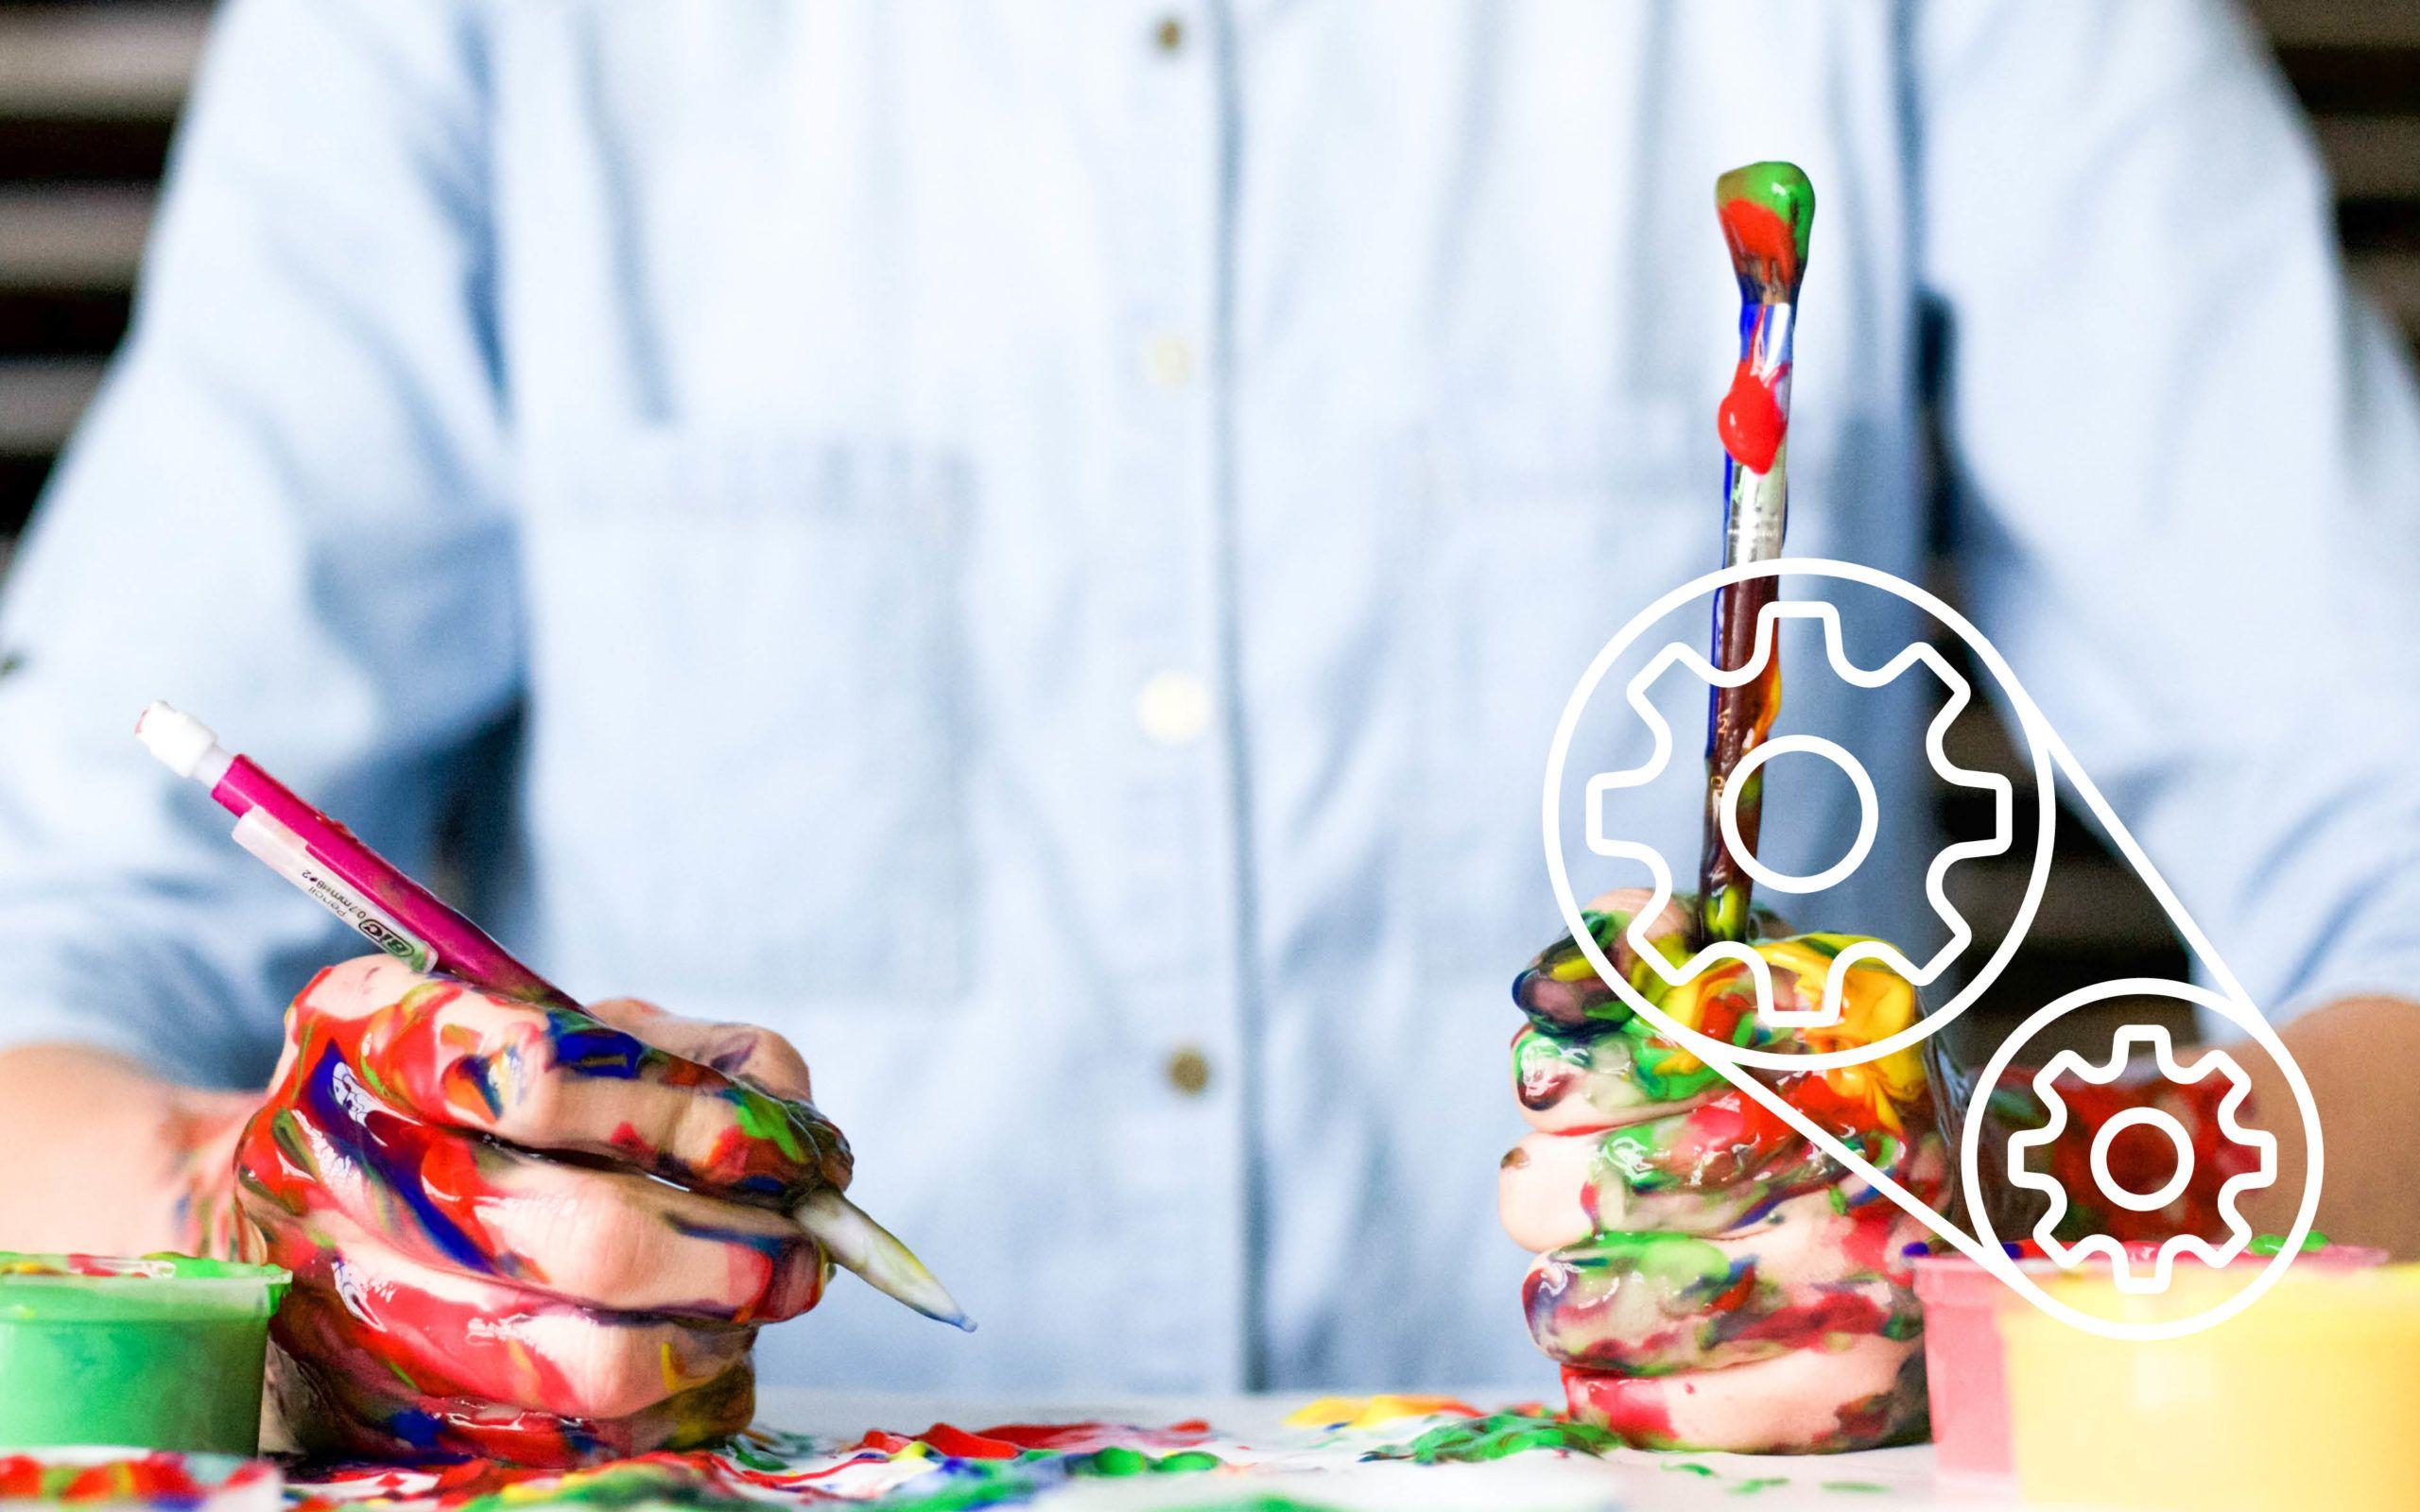 Design Thinking: 5 lessen uit de praktijk